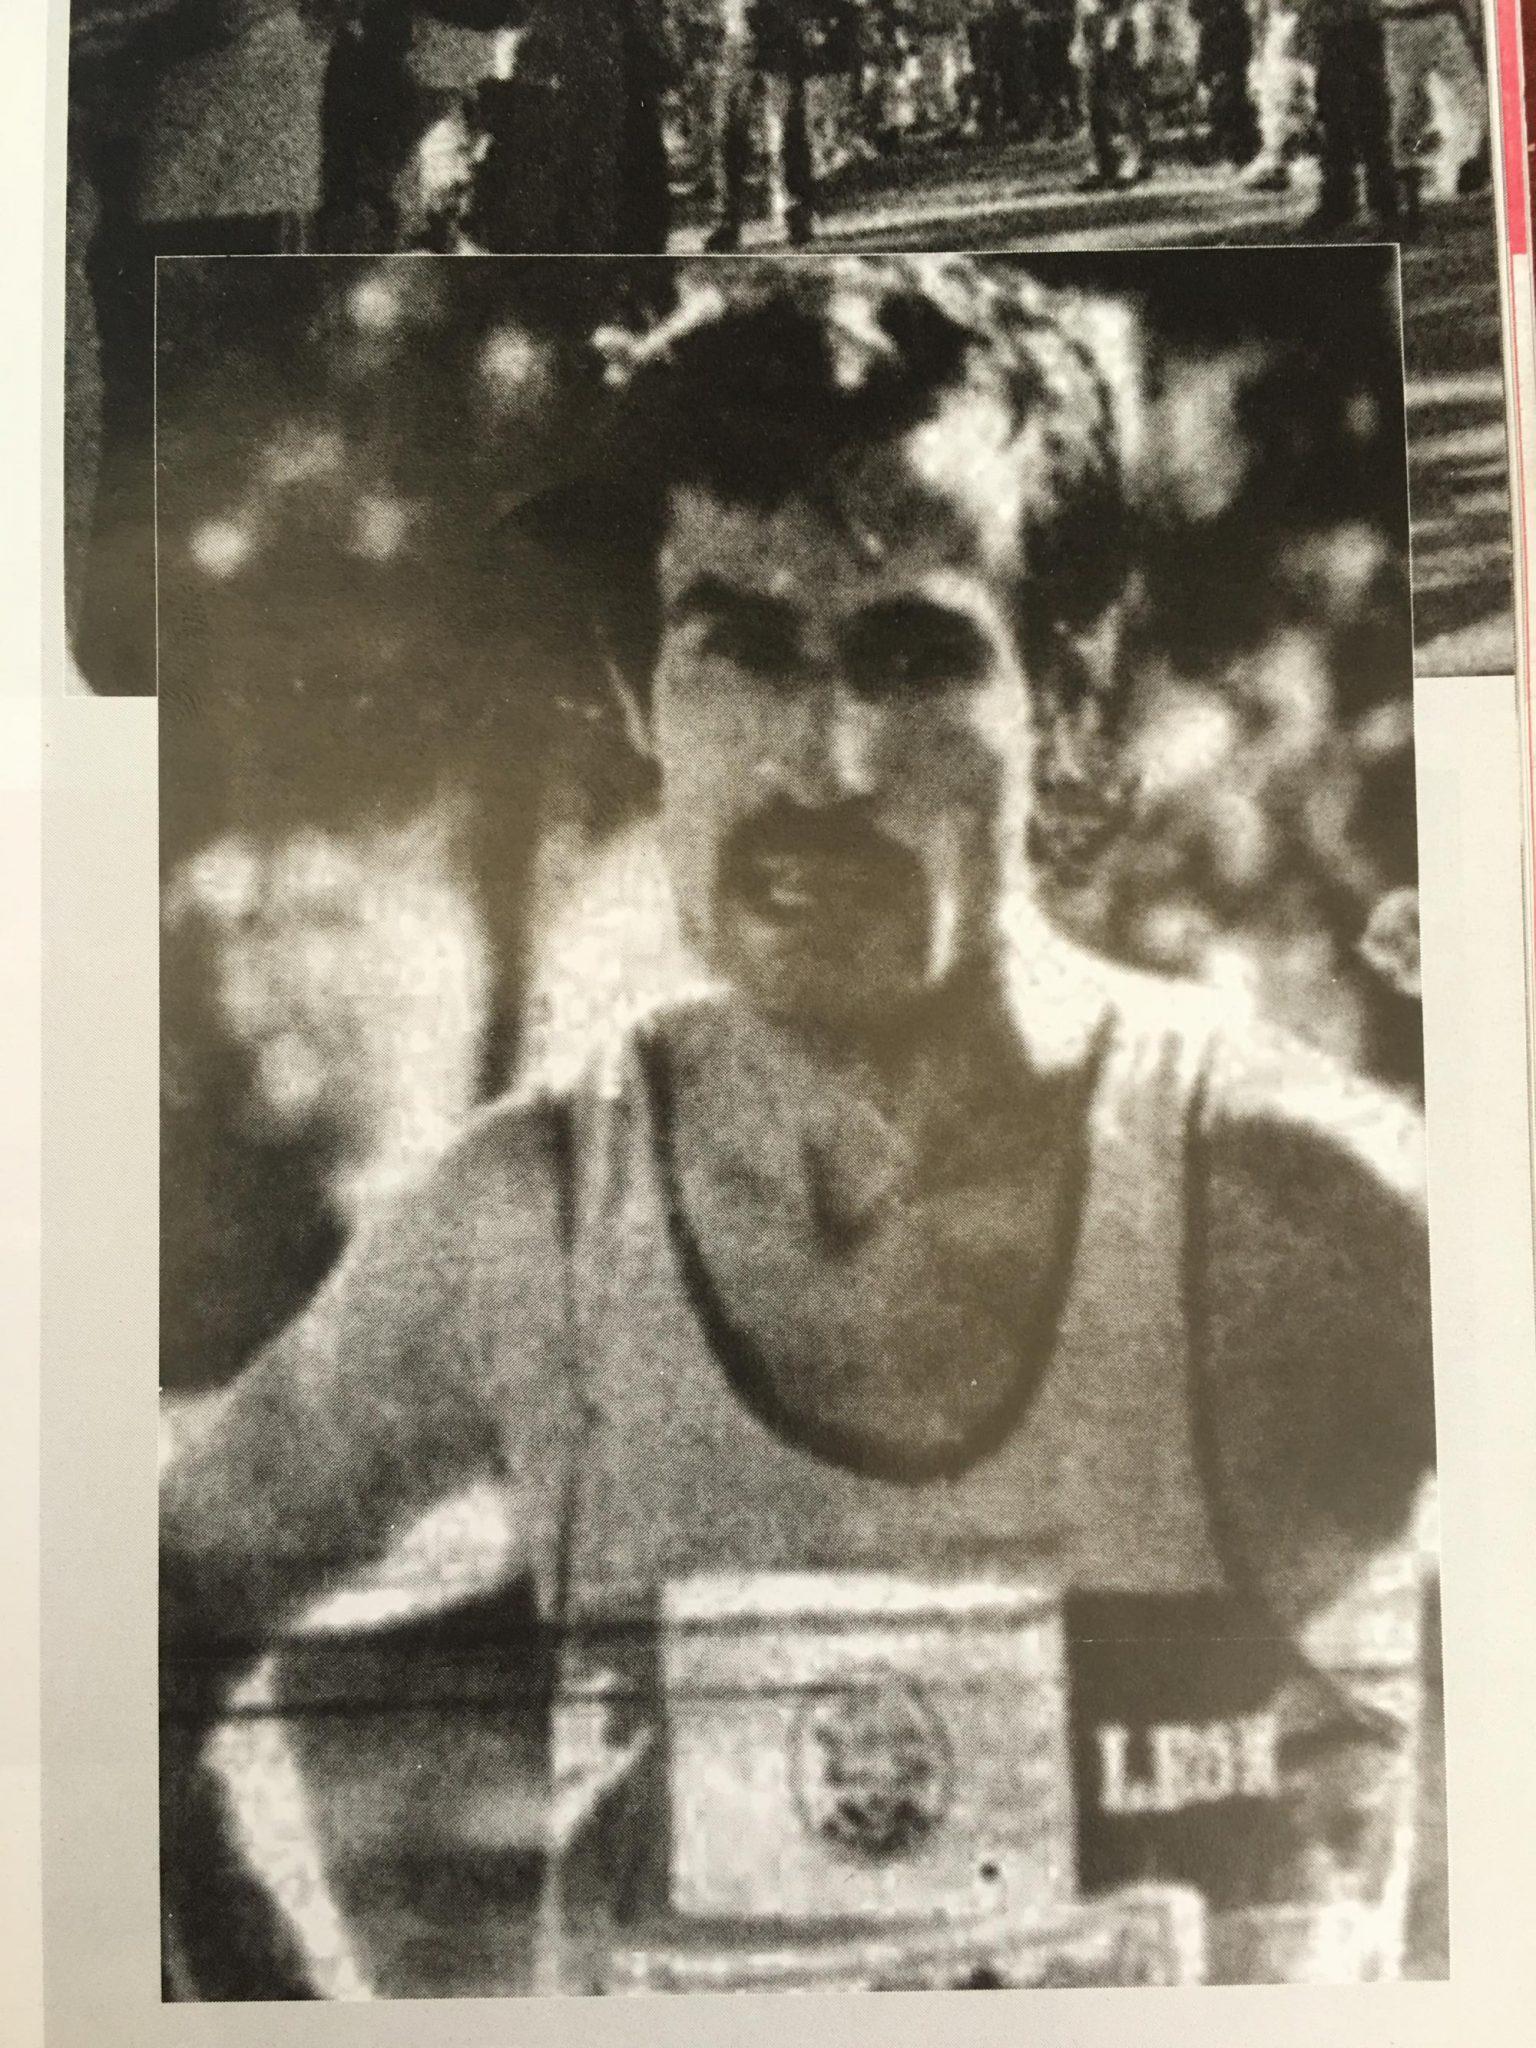 andres-torres-maraton-leon-guiar-2016-2